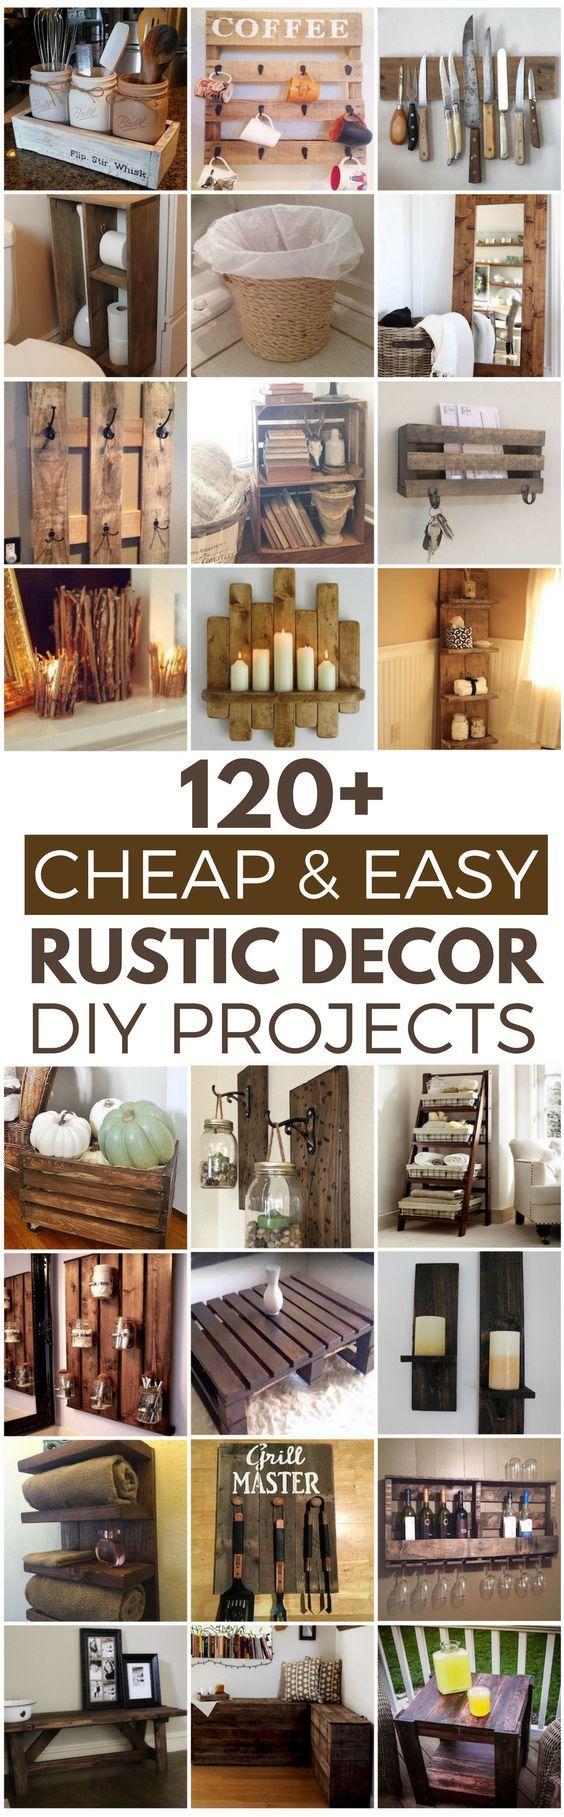 120 Cheap and Easy DIY Rustic Home Decor Ideas | Interiors, DIY ...